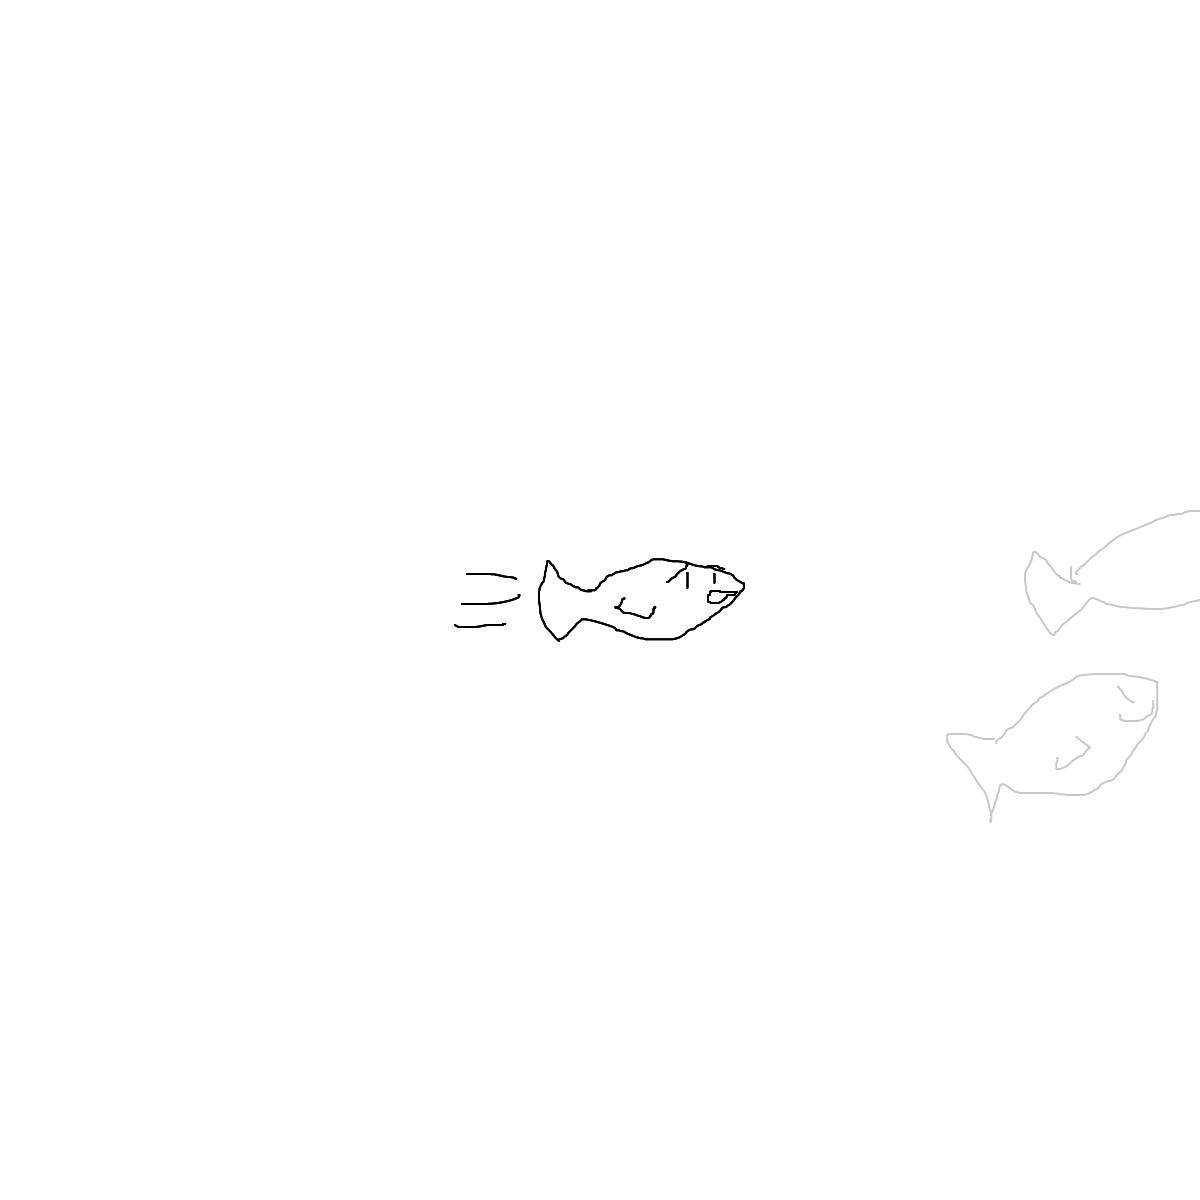 BAAAM drawing#10645 lat:43.5831260681152340lng: -79.3968353271484400